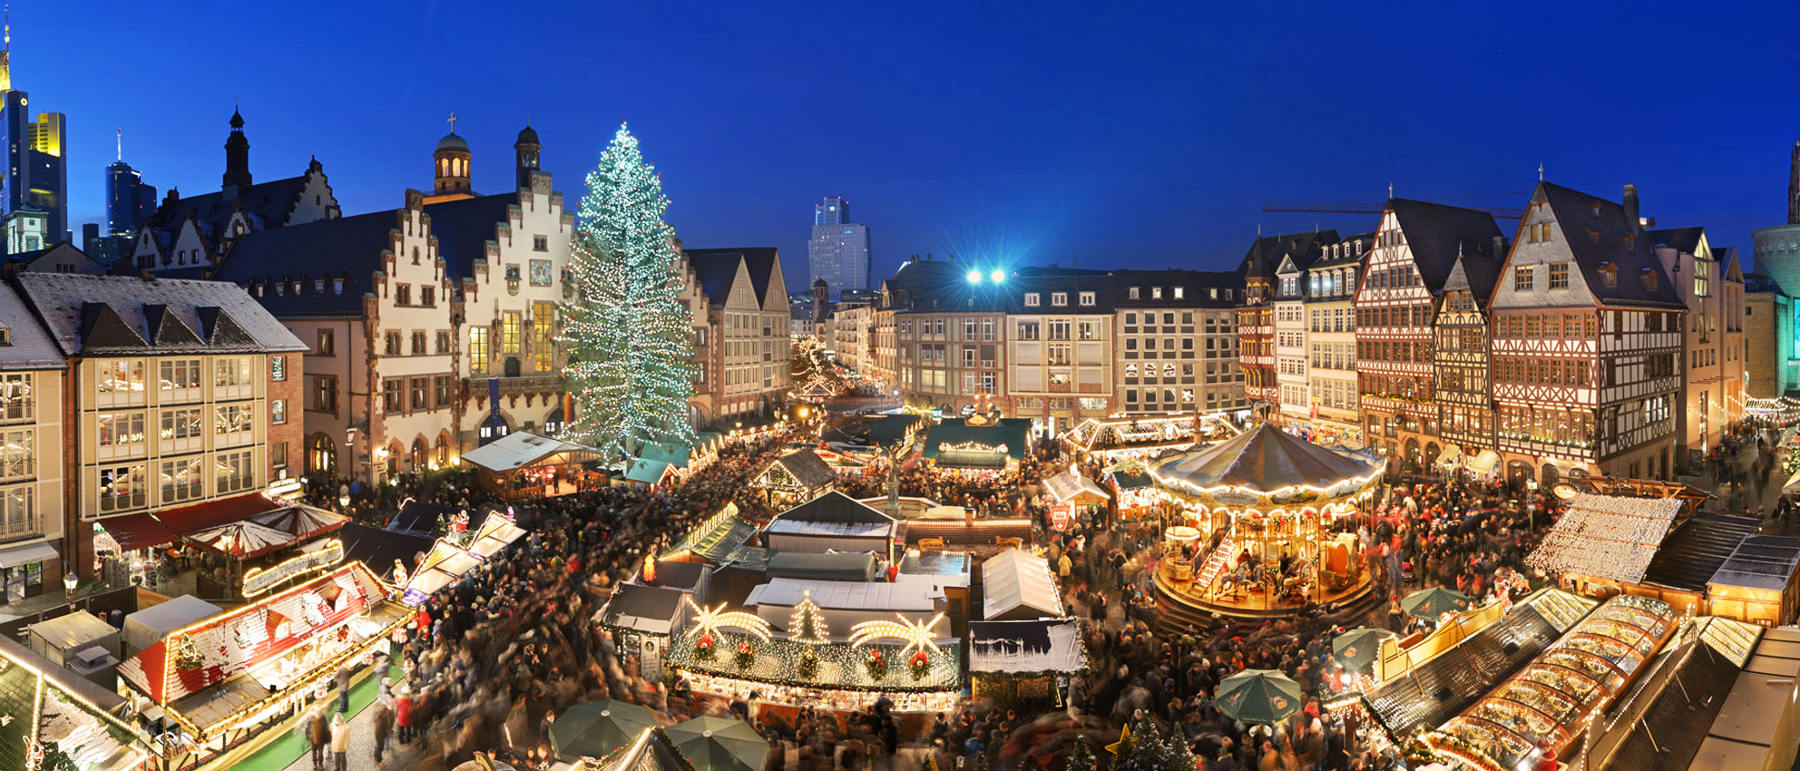 Photo of Christmas Market in piazza Walther, Bolzano - Bozen